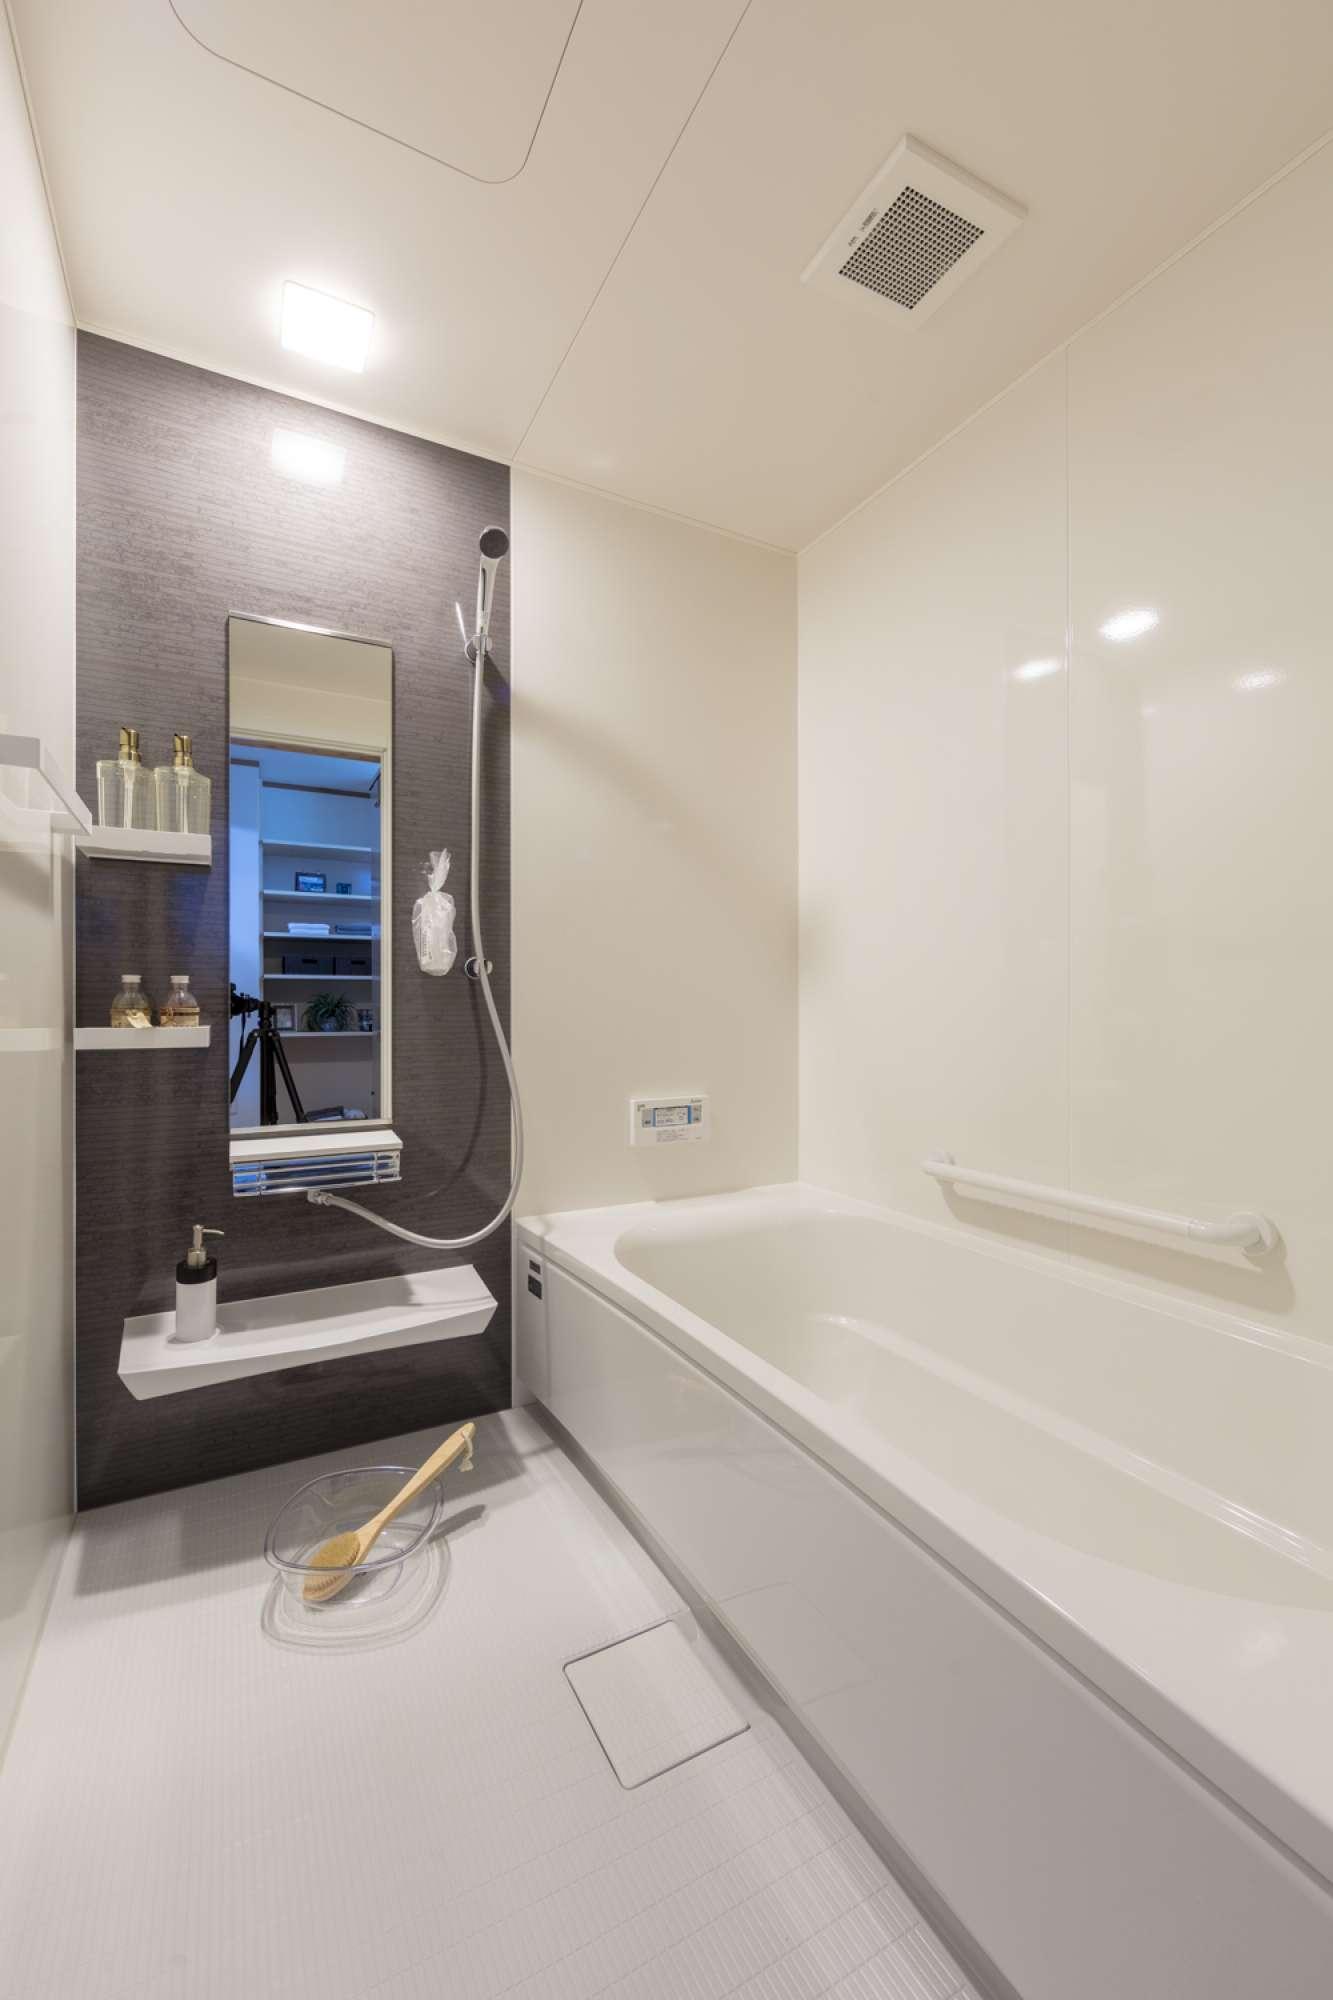 浴室 1坪 -  -  -